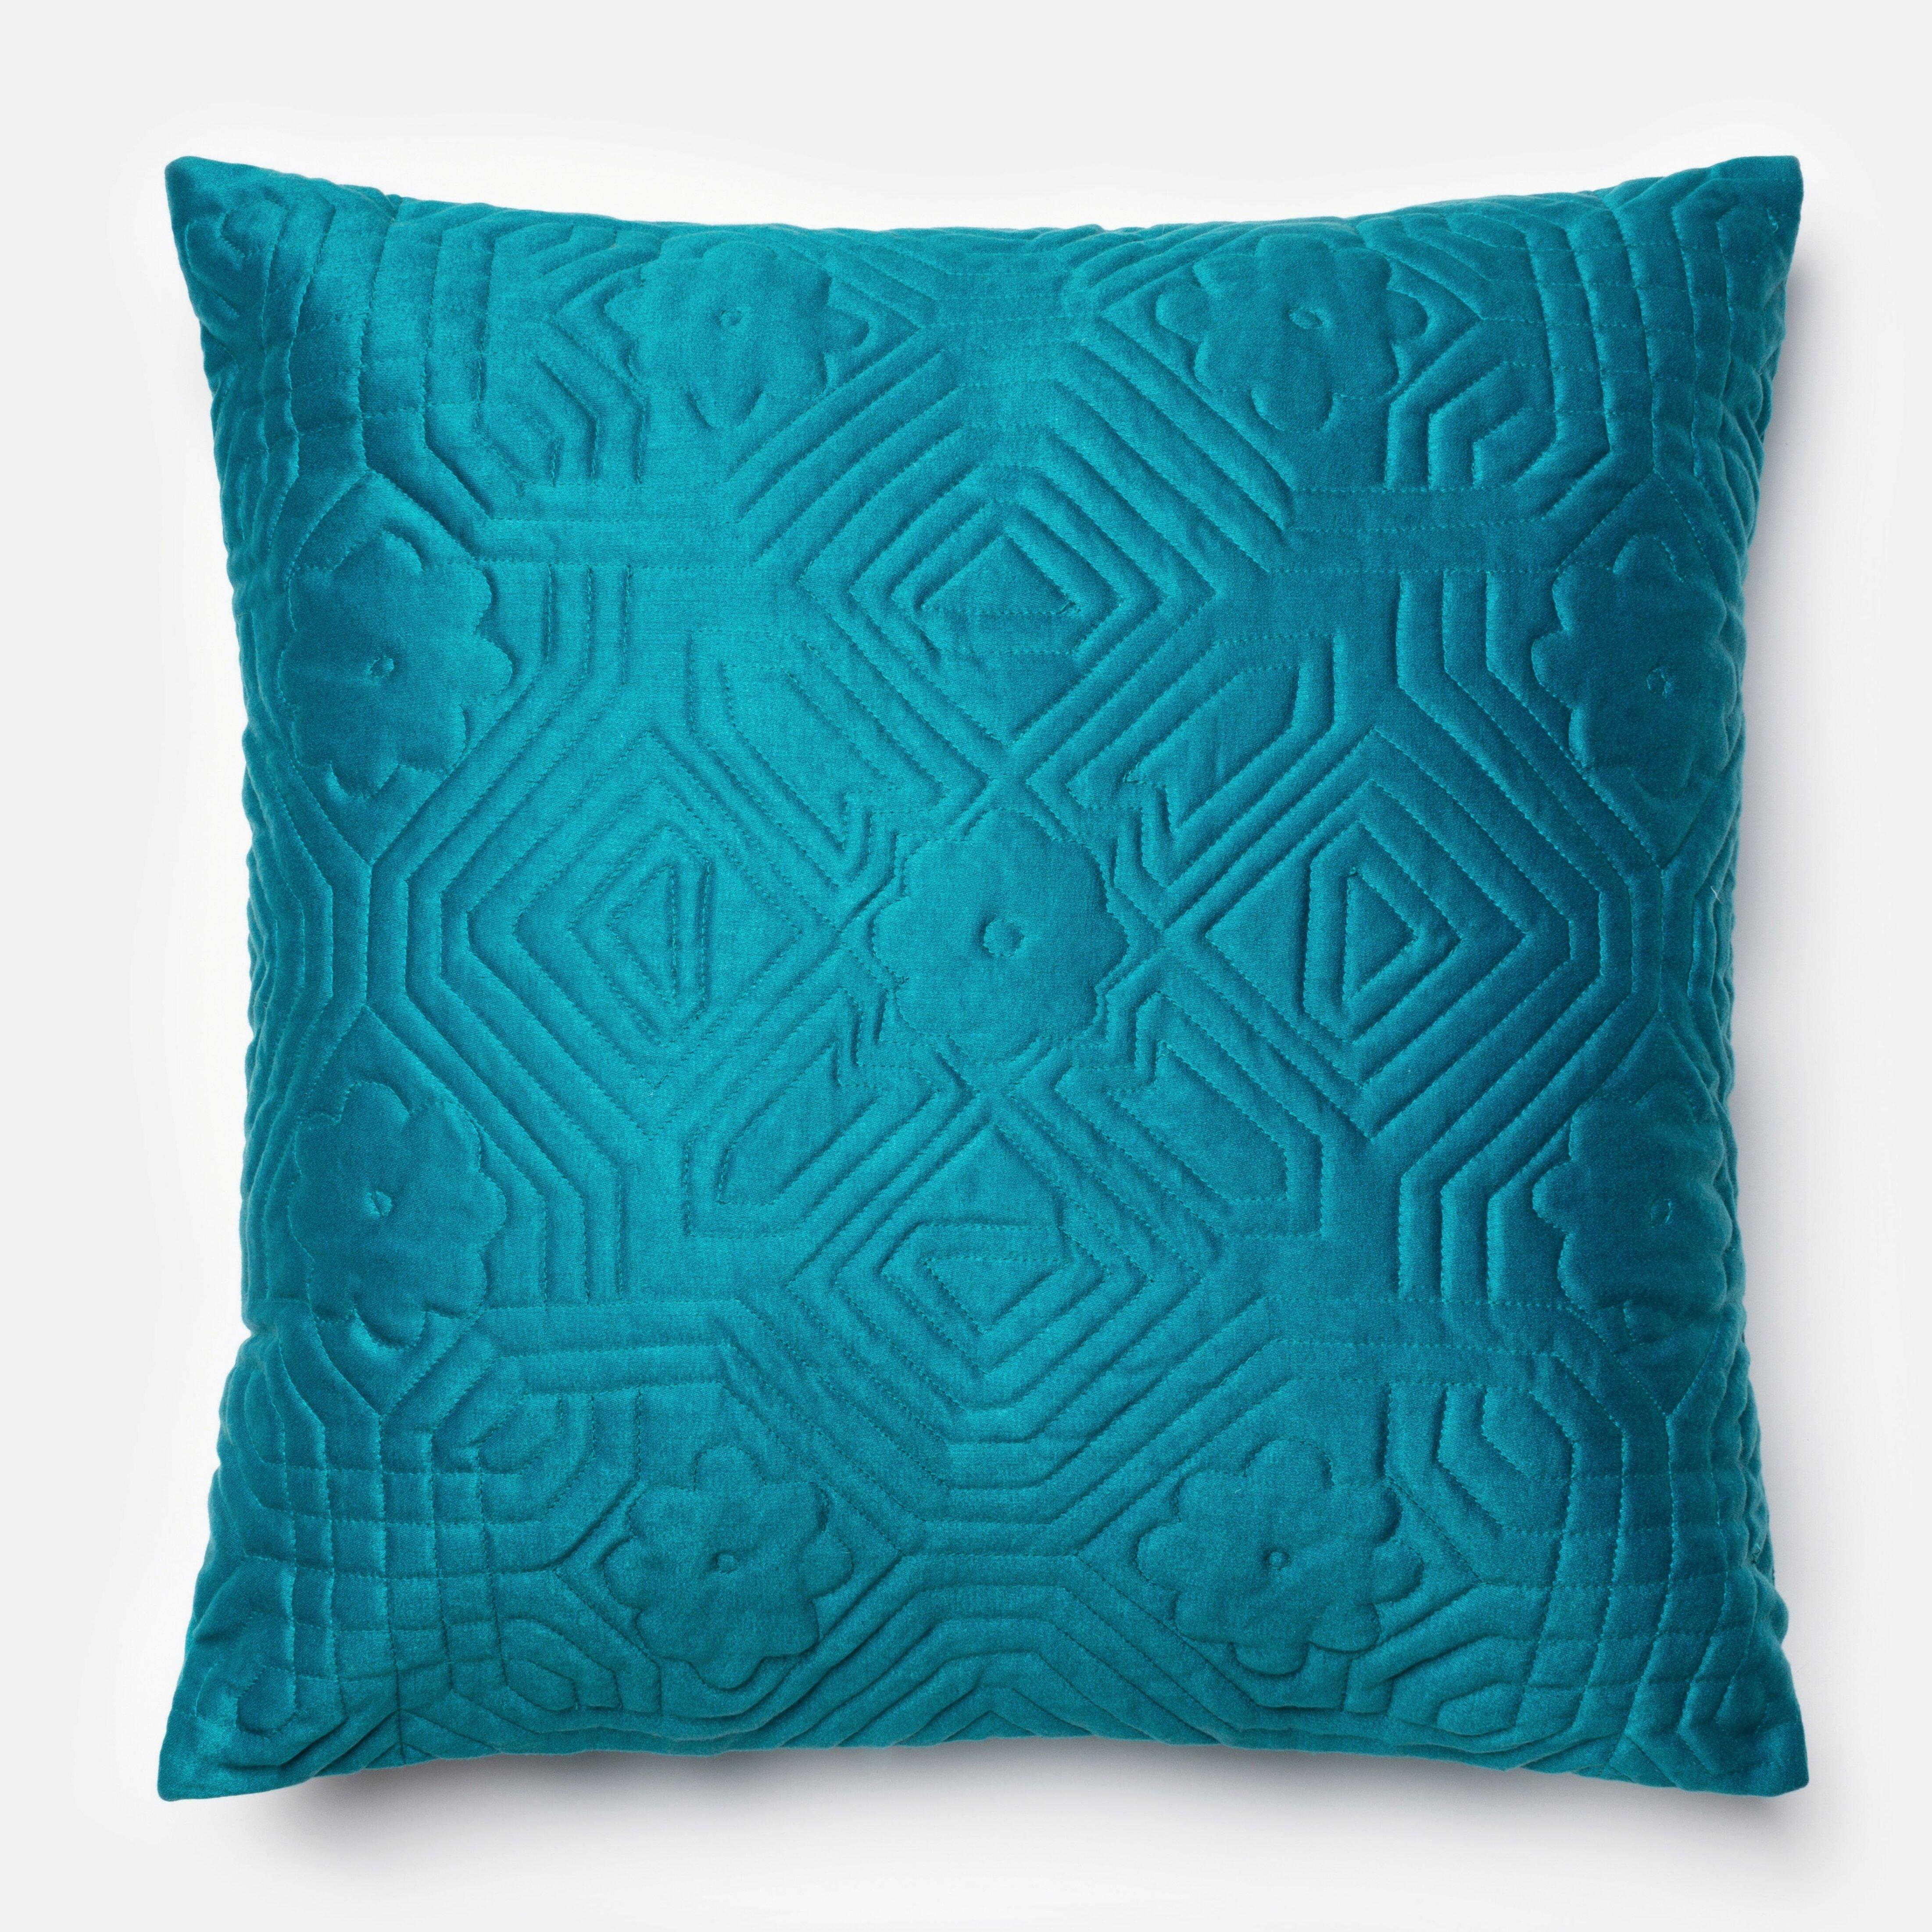 Loloi rugs throw pillow reviews wayfair for Loloi pillows